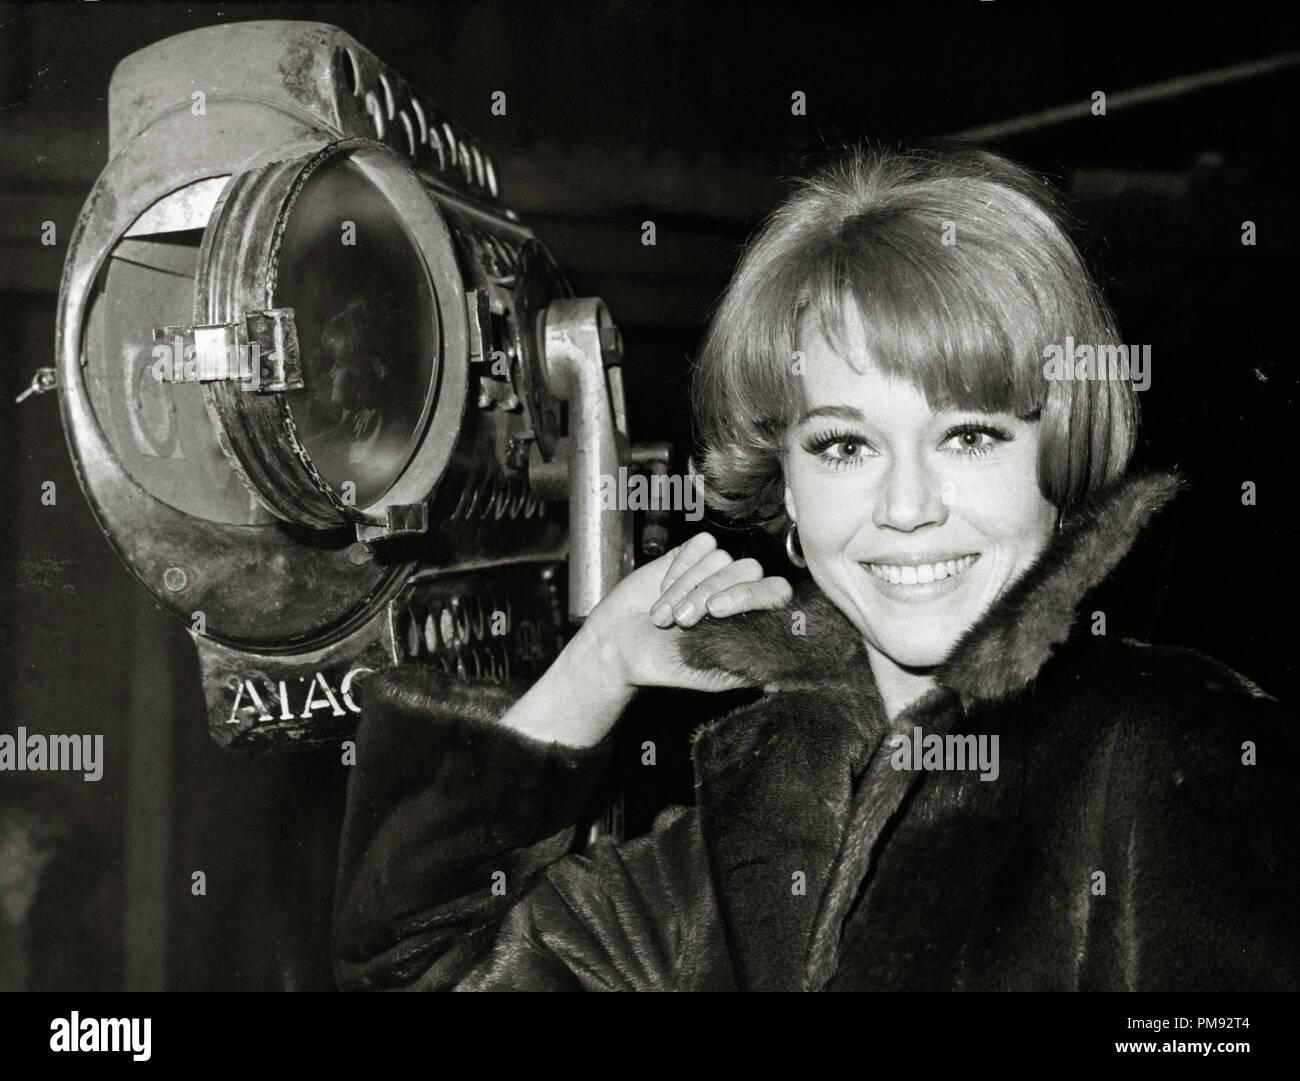 (Archivierung klassische Kino - Jane Fonda Retrospektive) Jane Fonda, circa 1964. Stockbild